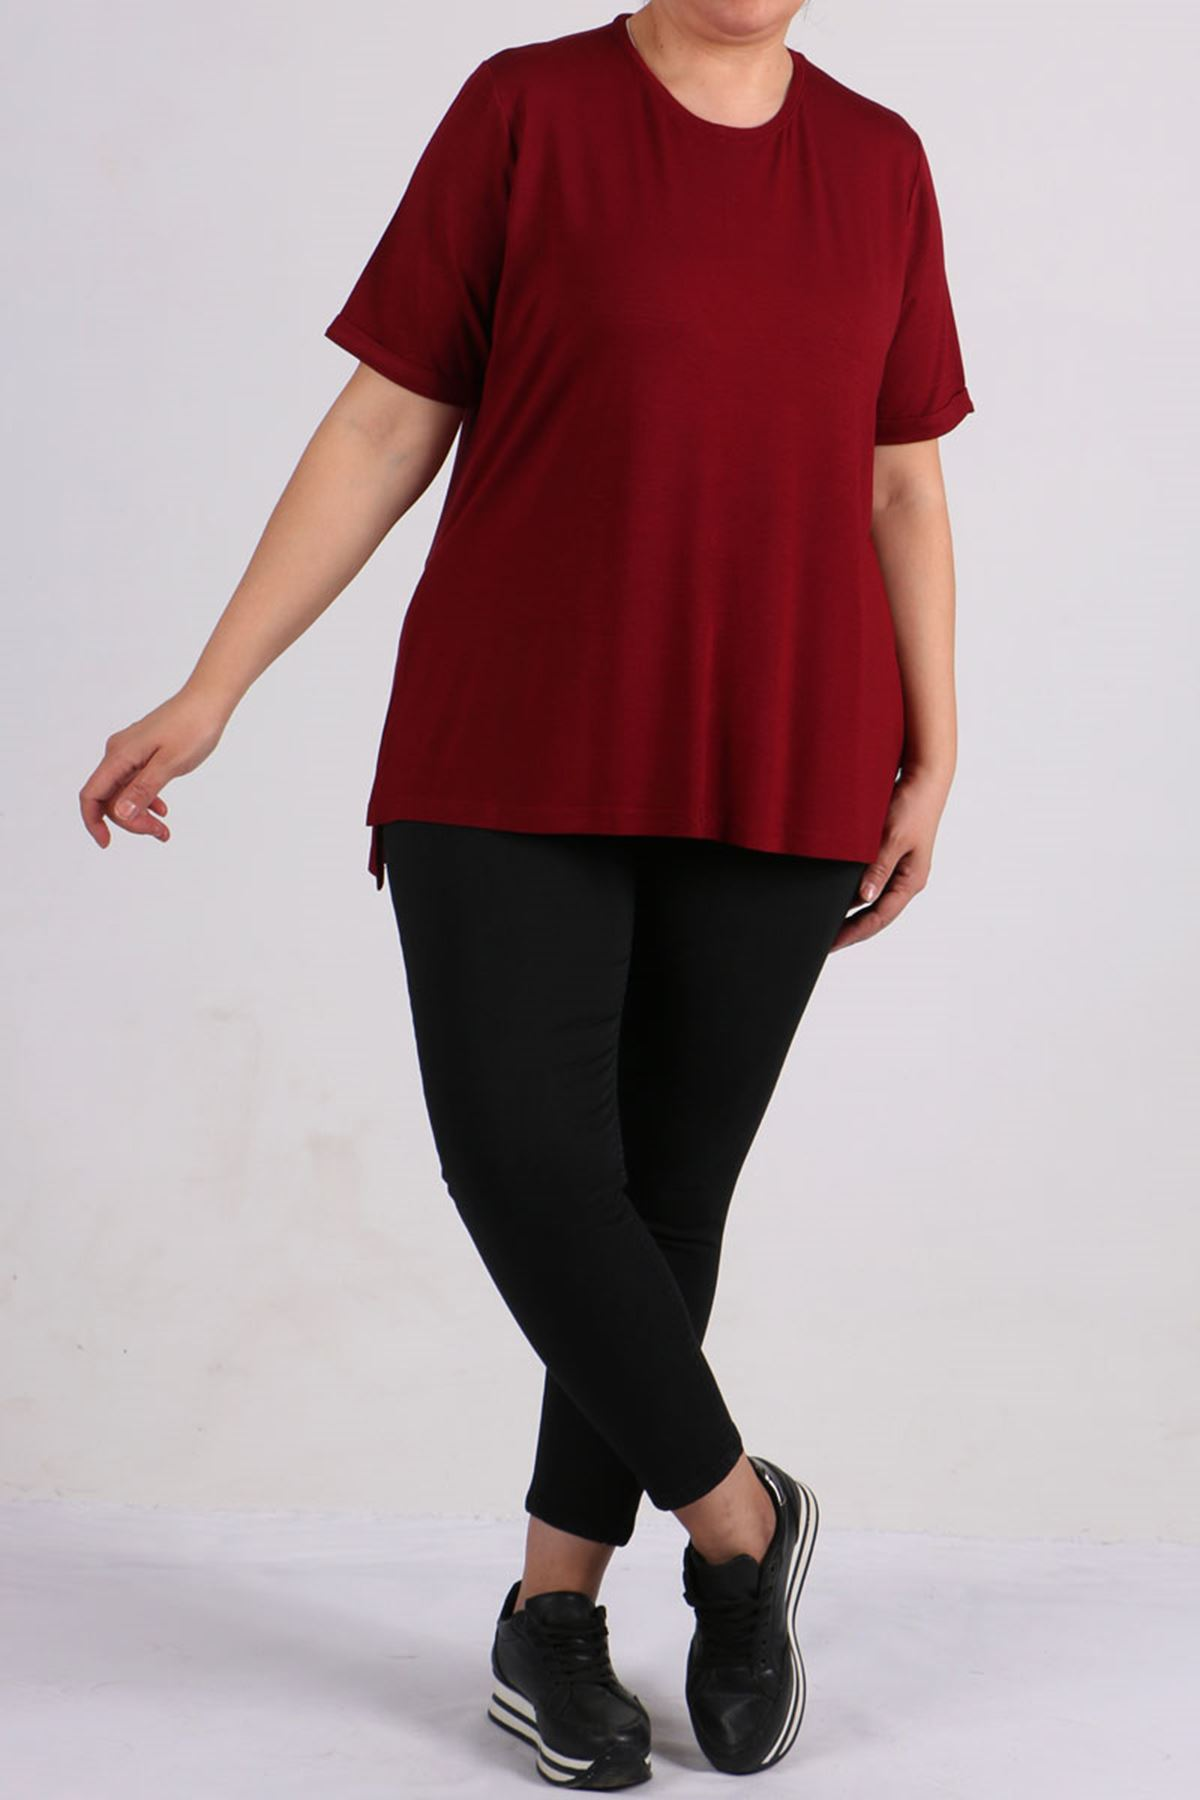 8529 Plus Size Basic T-shirt - Claret Red